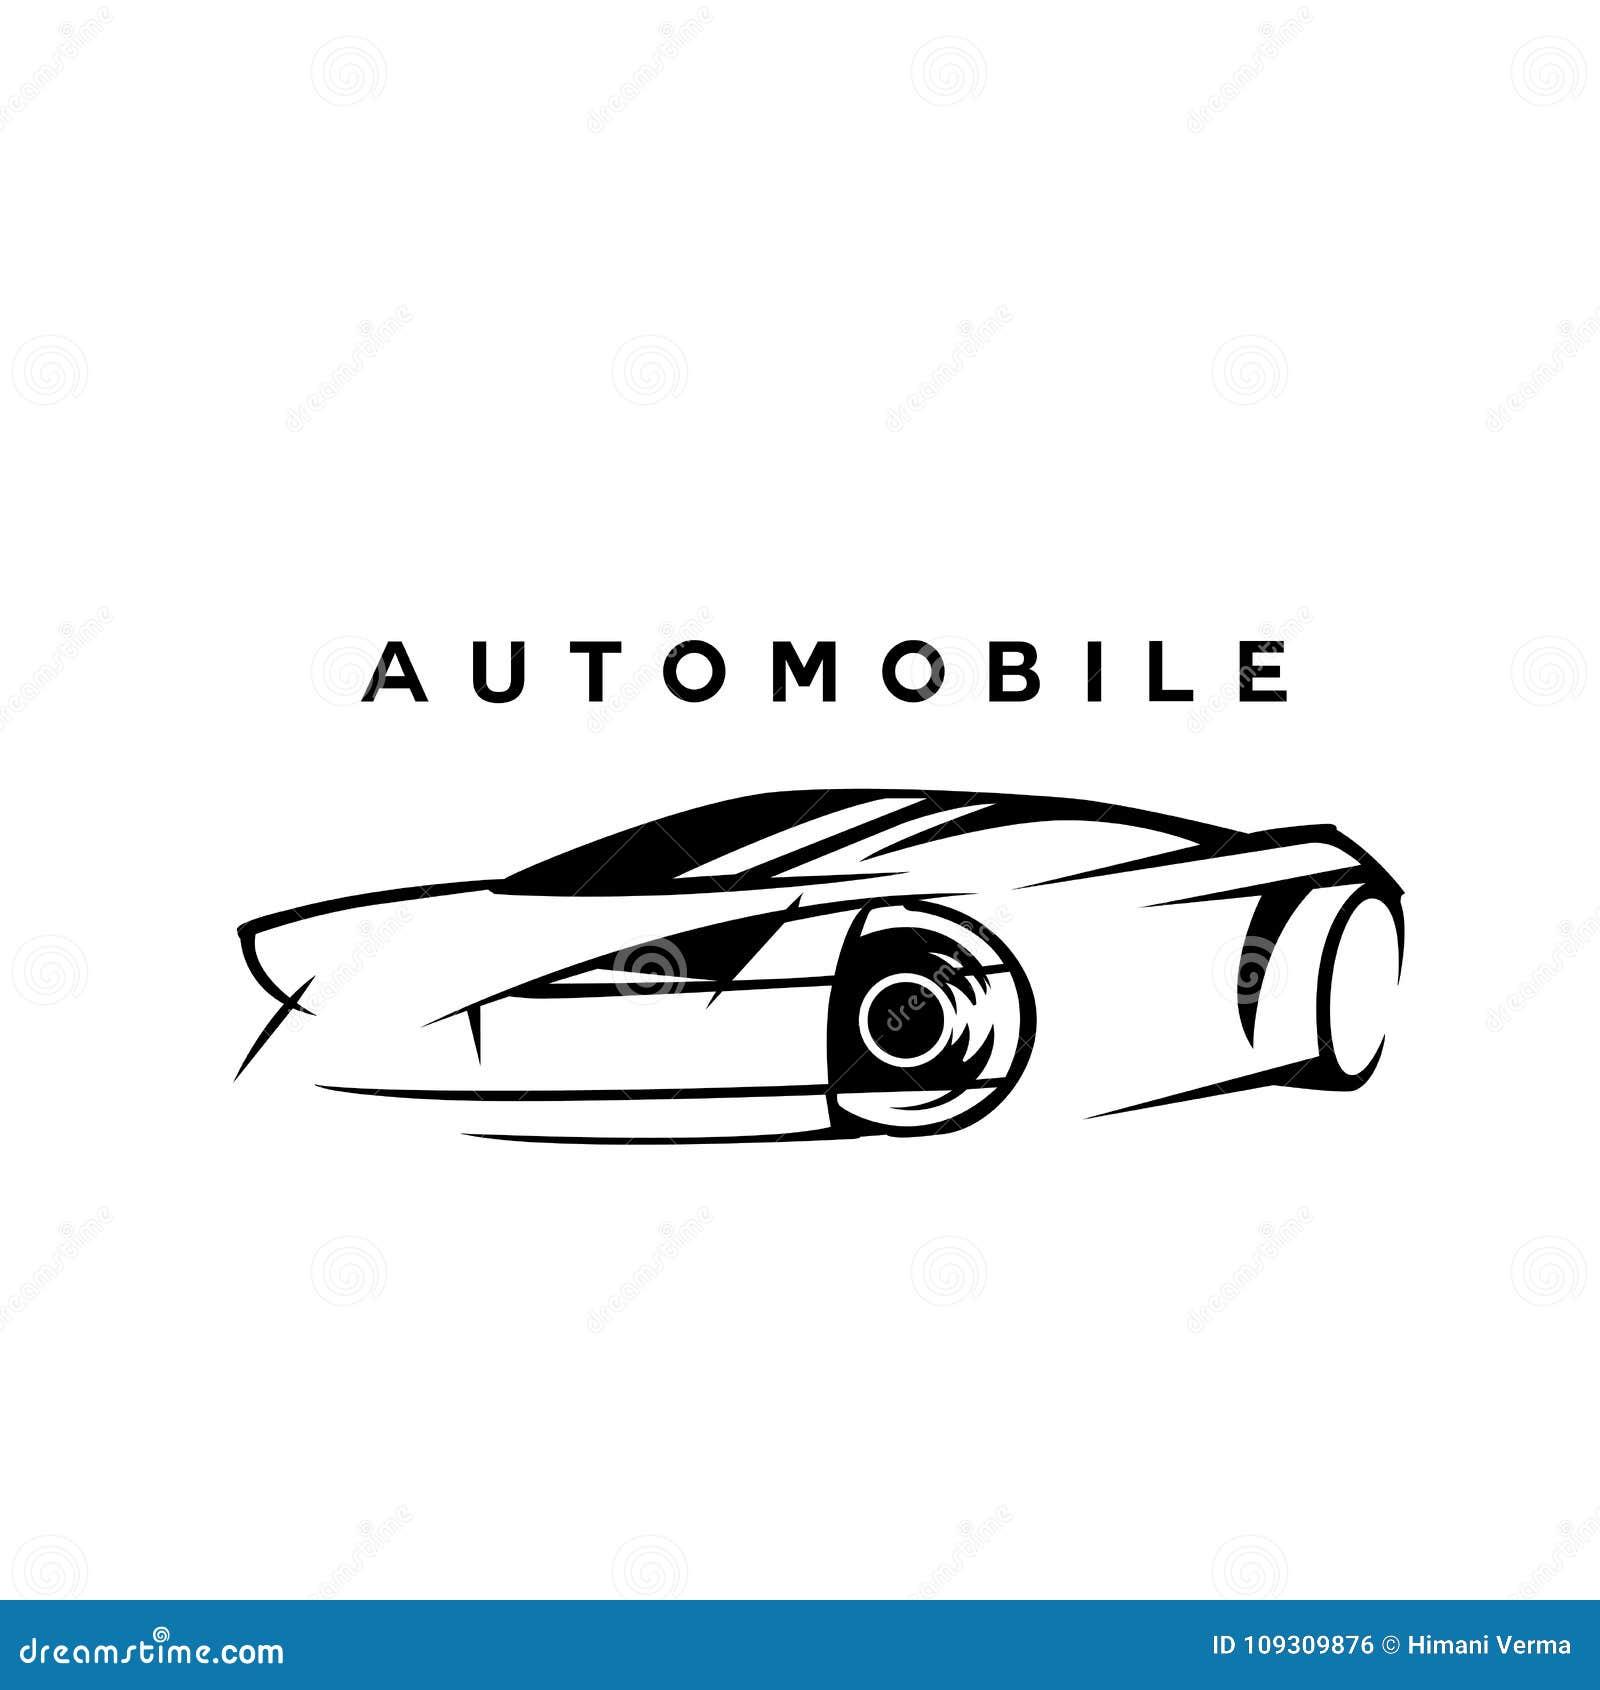 Den svartvita bilen skissar vektorillustrationen